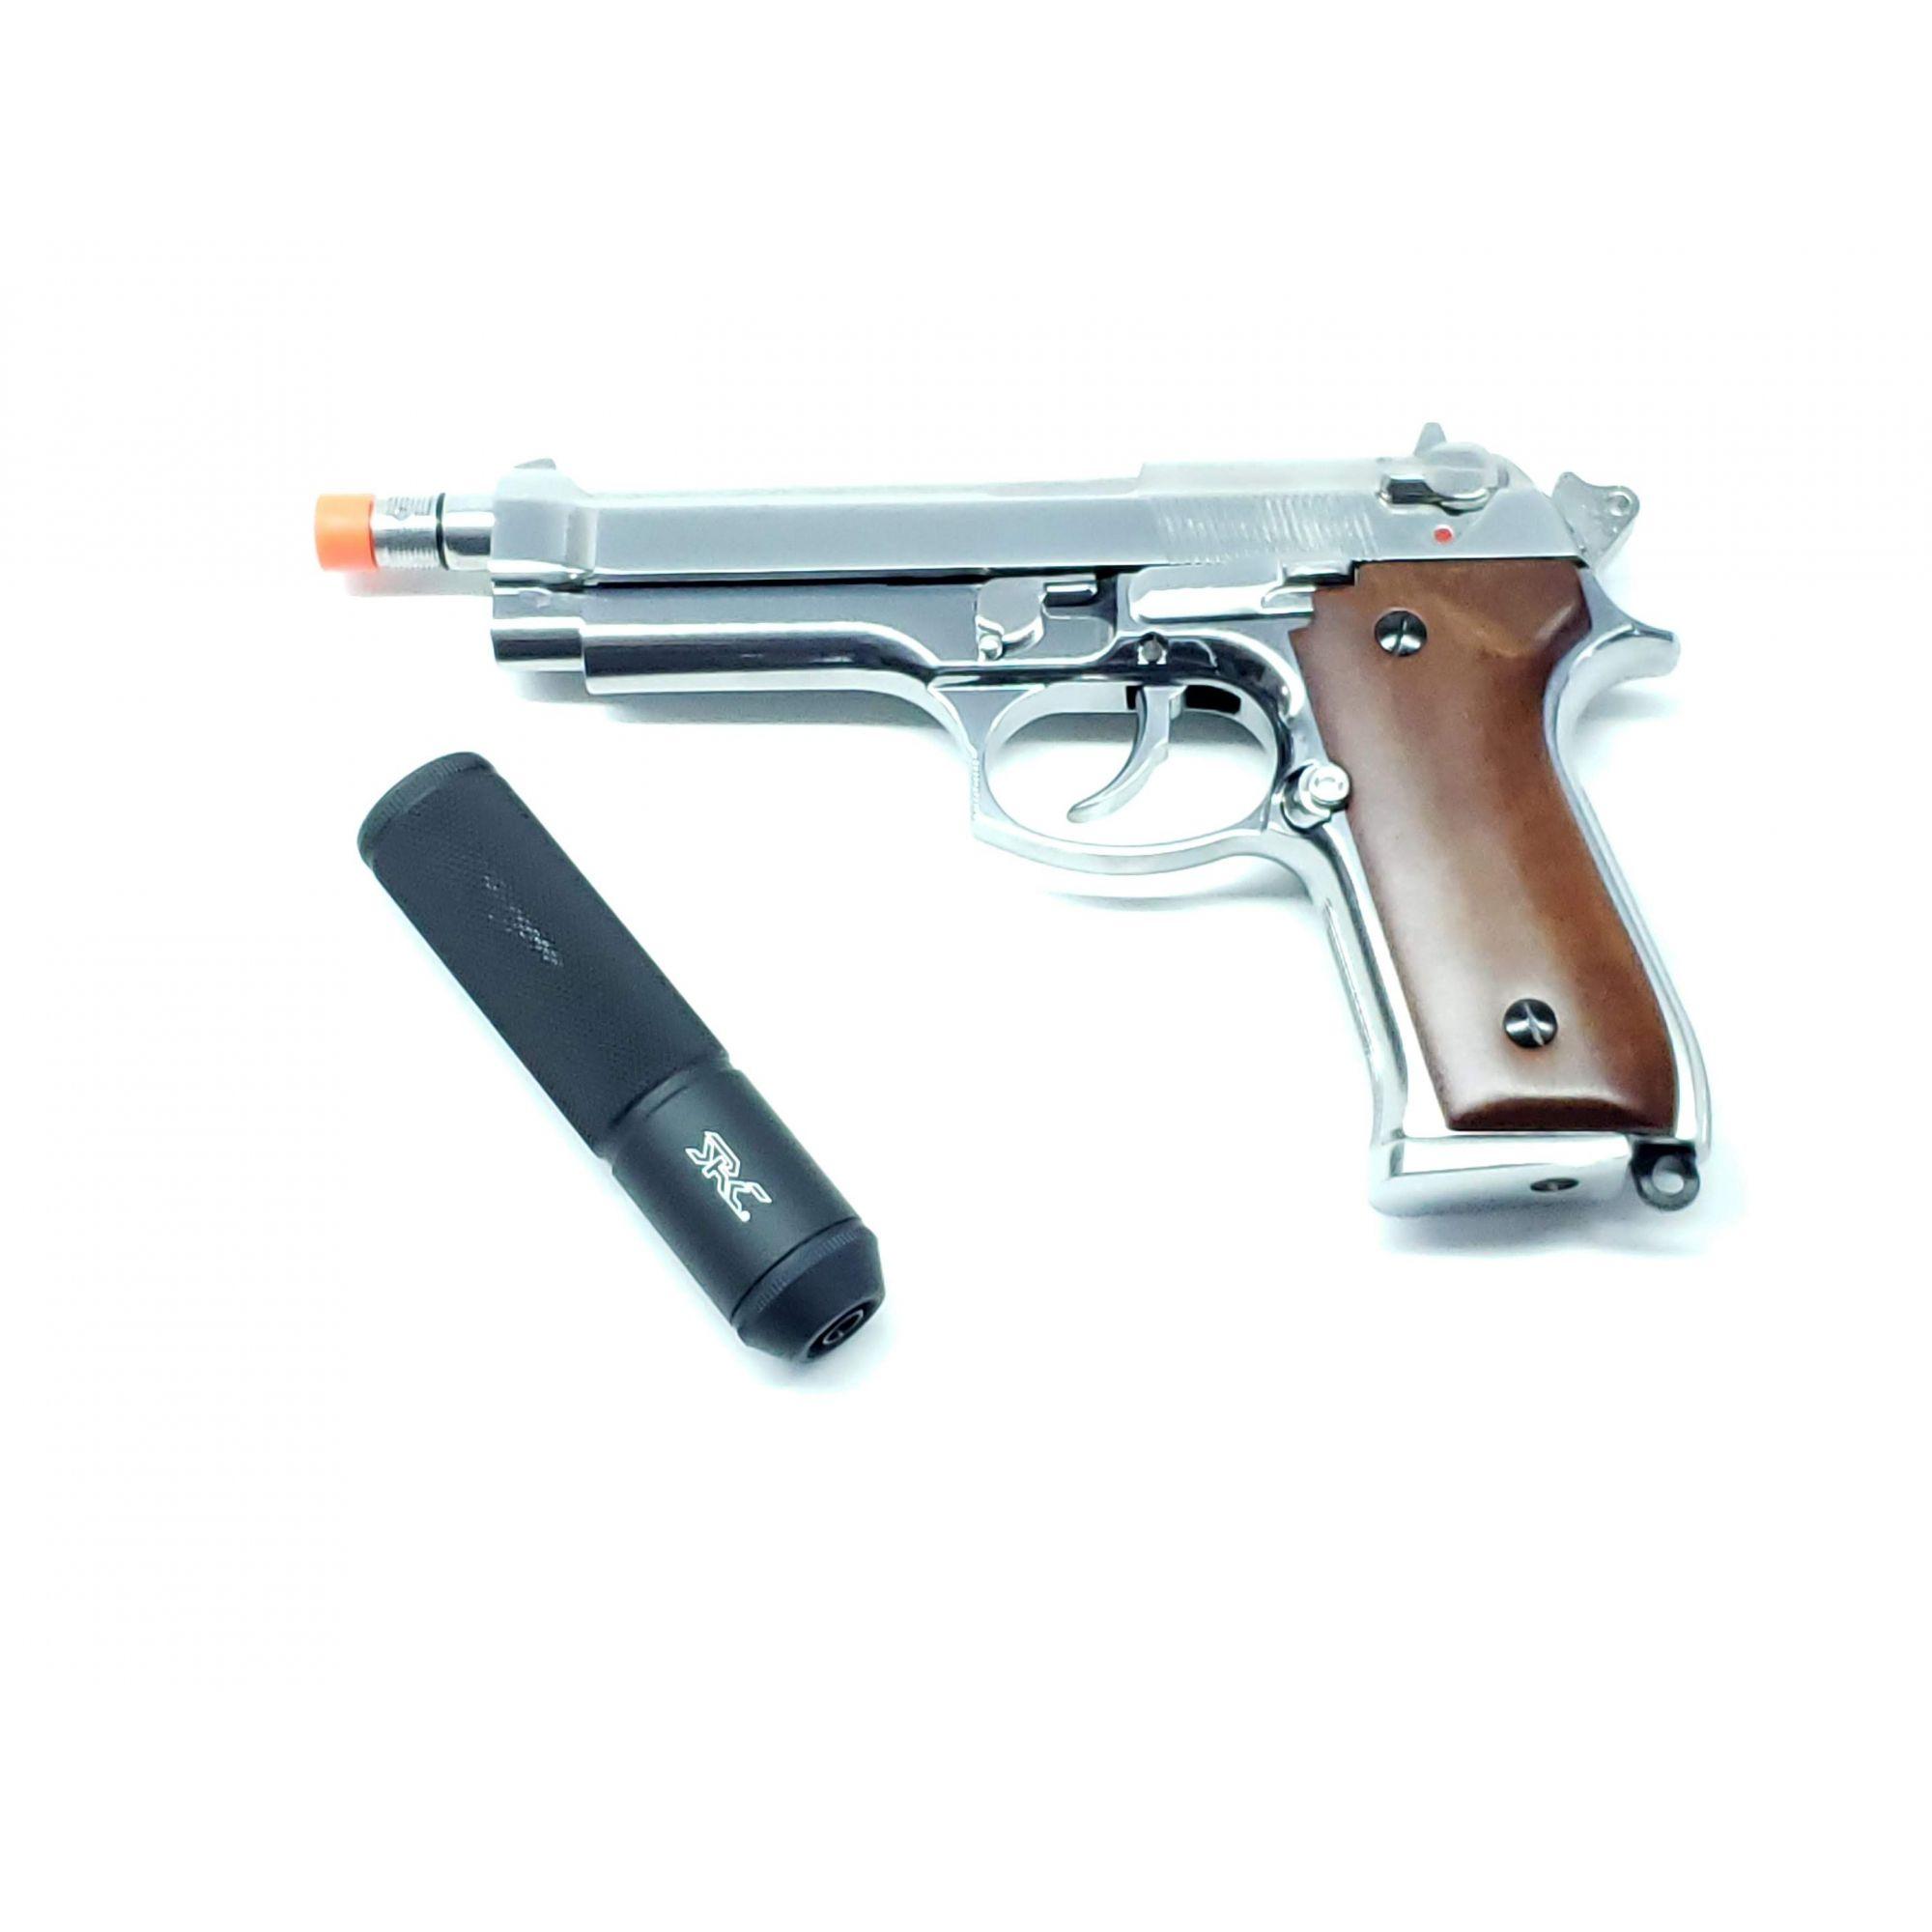 Pistola Airsoft SRC Sr92 Sp M92 Wood Greengas